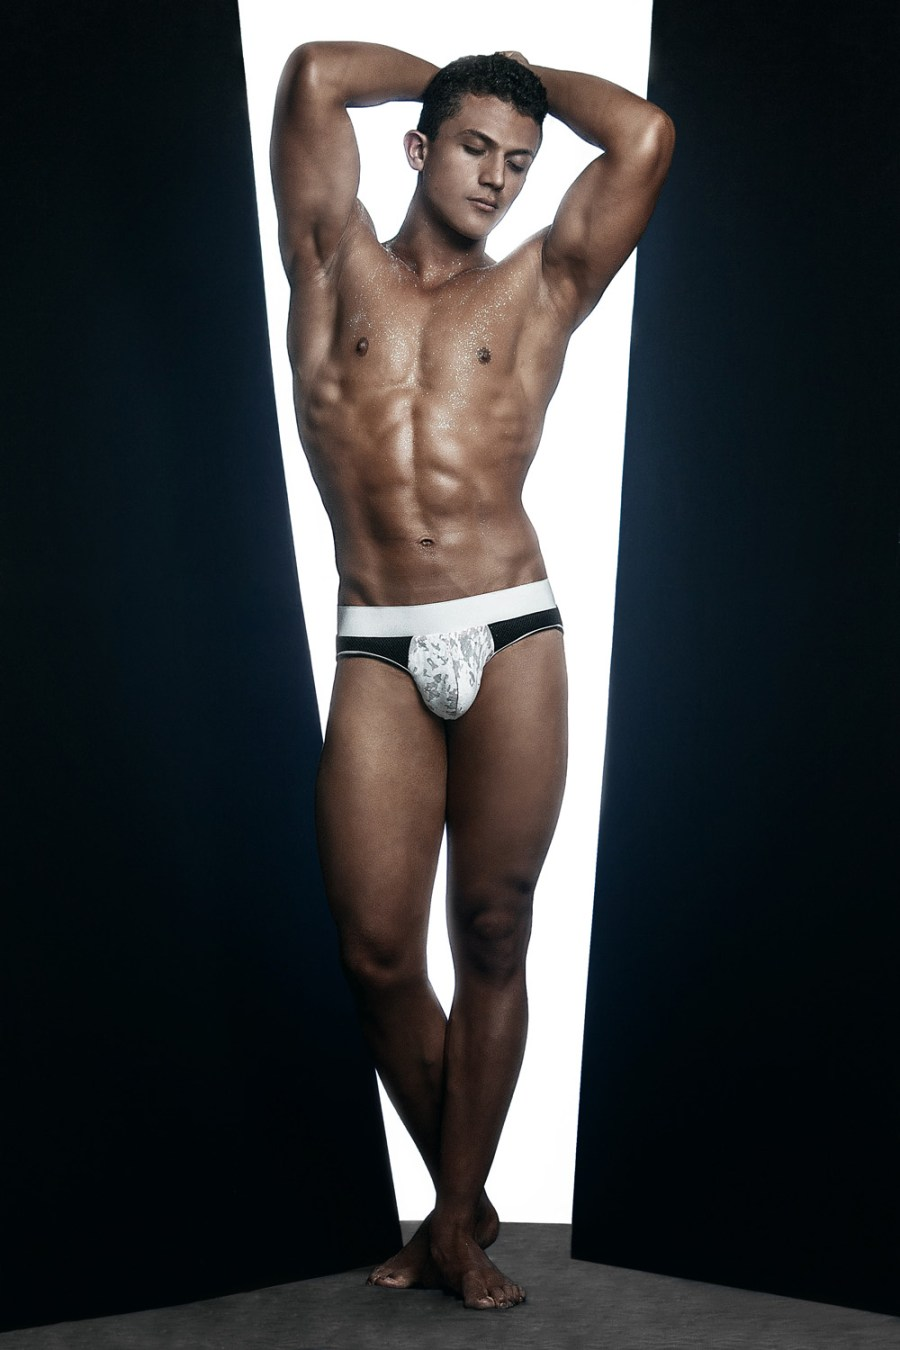 Erik Ramos by Chris Femat for Fashionably Male418